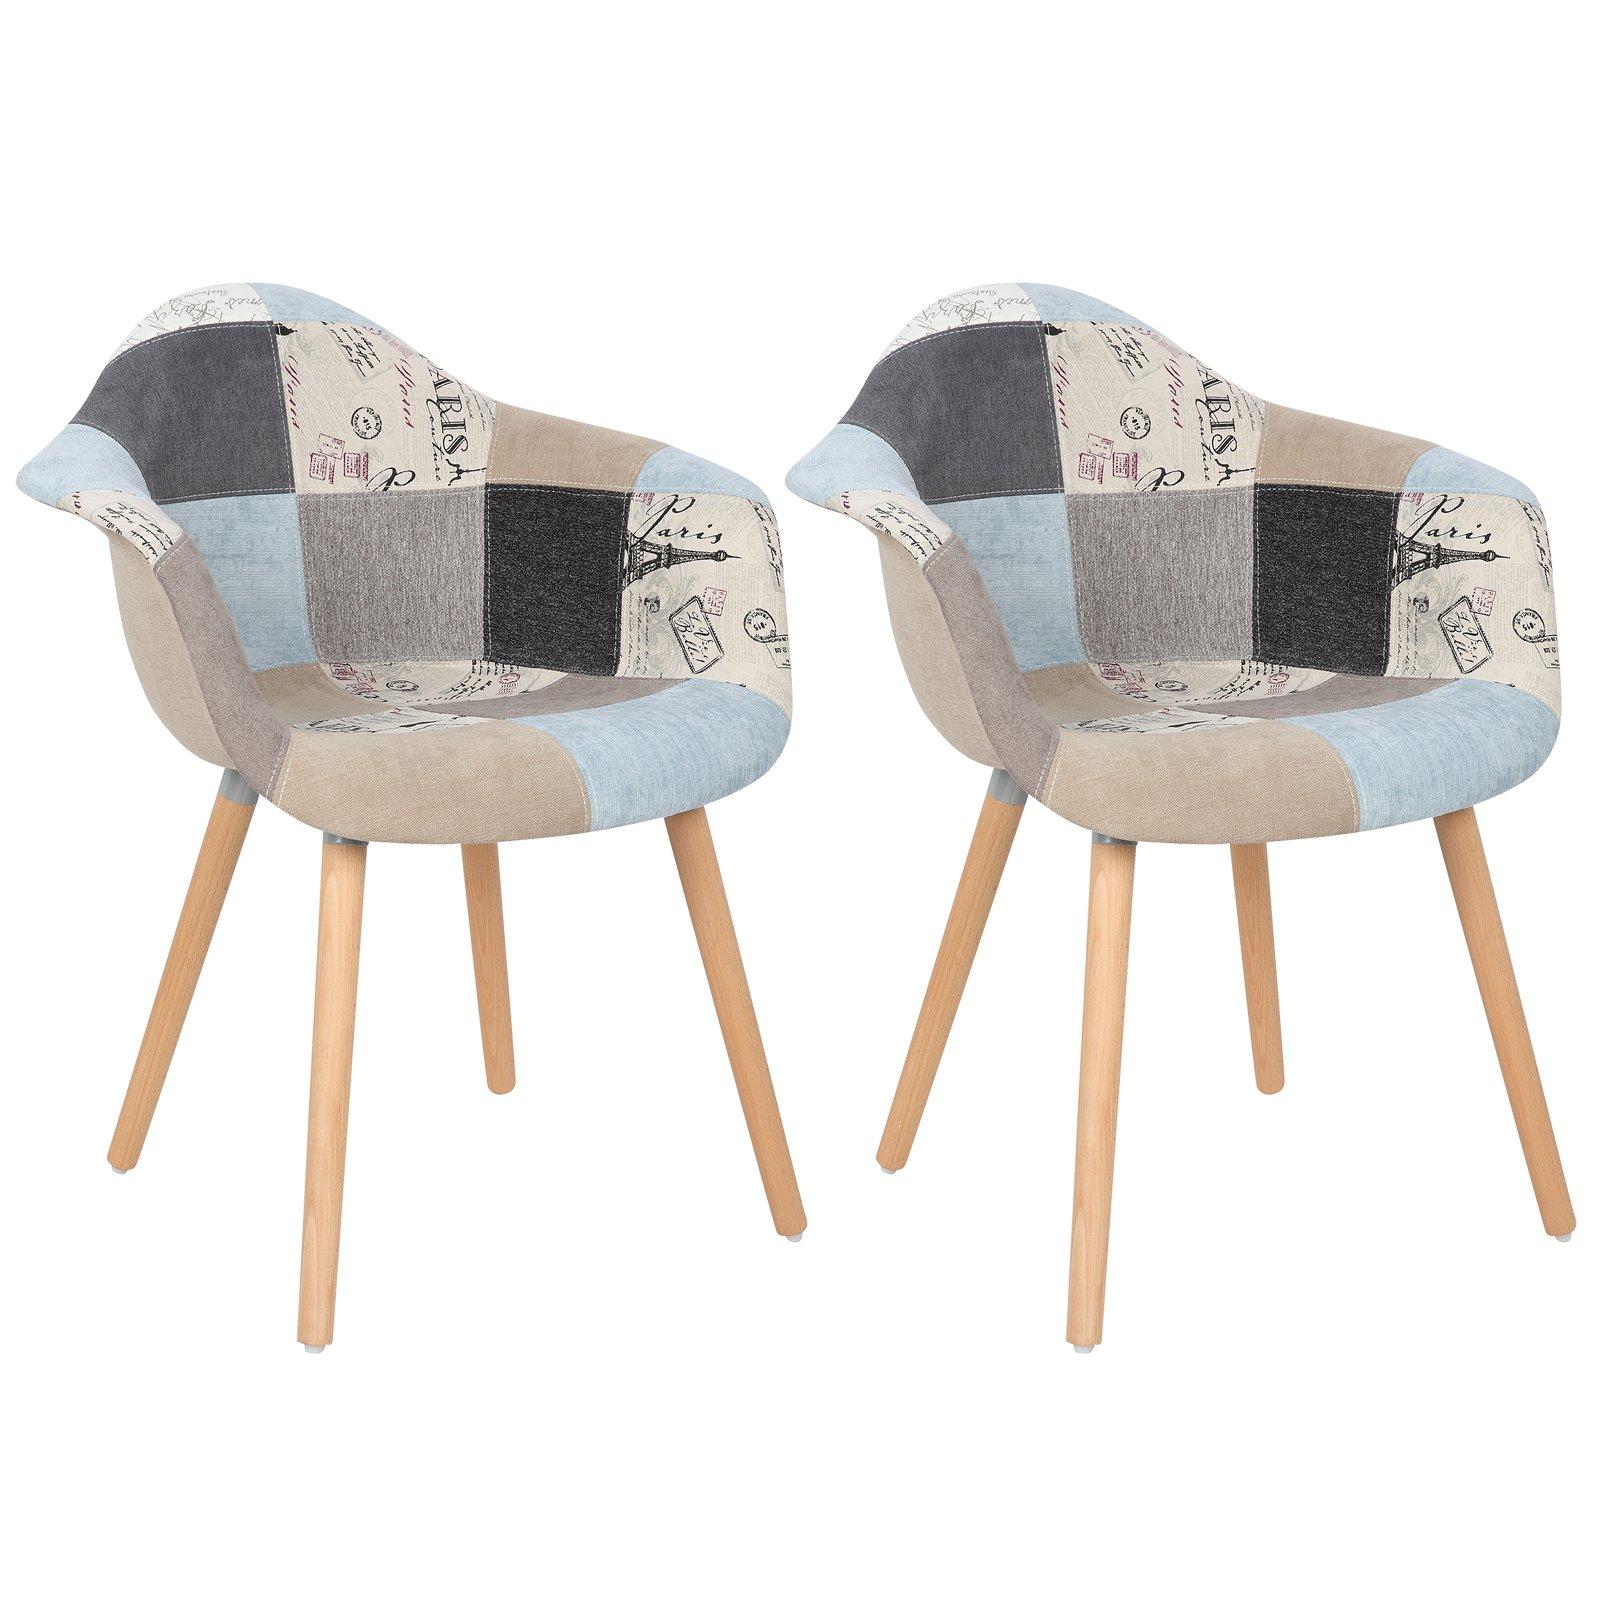 Woltu Silla de Comedor con Respaldo Asiento de Lino Patchwork, Pata Madera Diseño Nórdico para